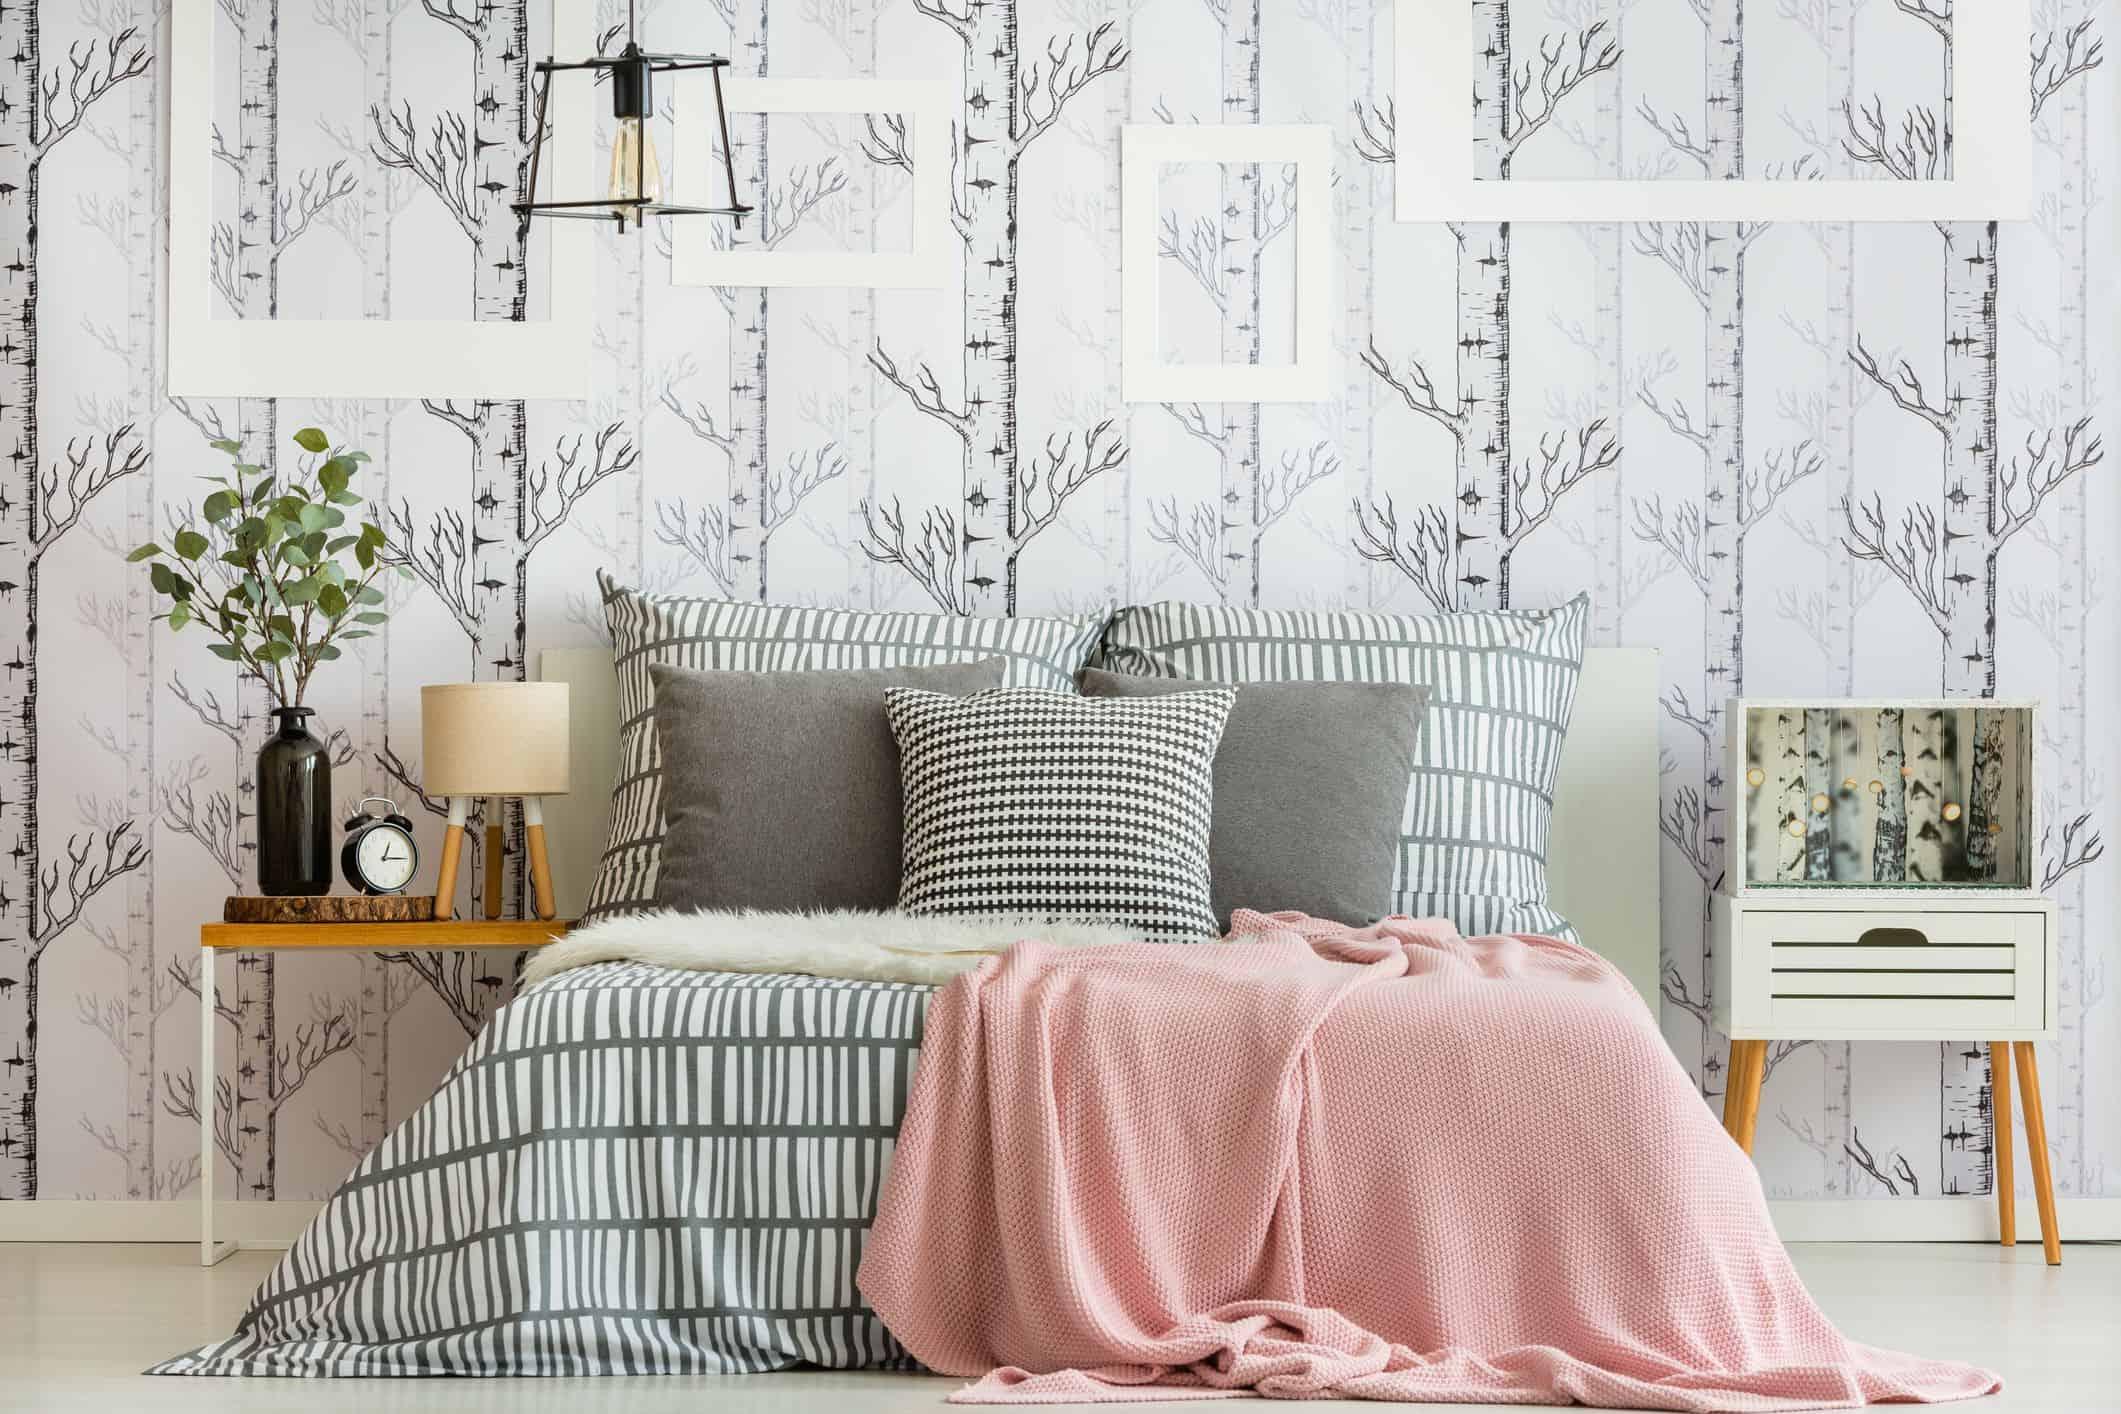 pattern wallppaer in small bedroom